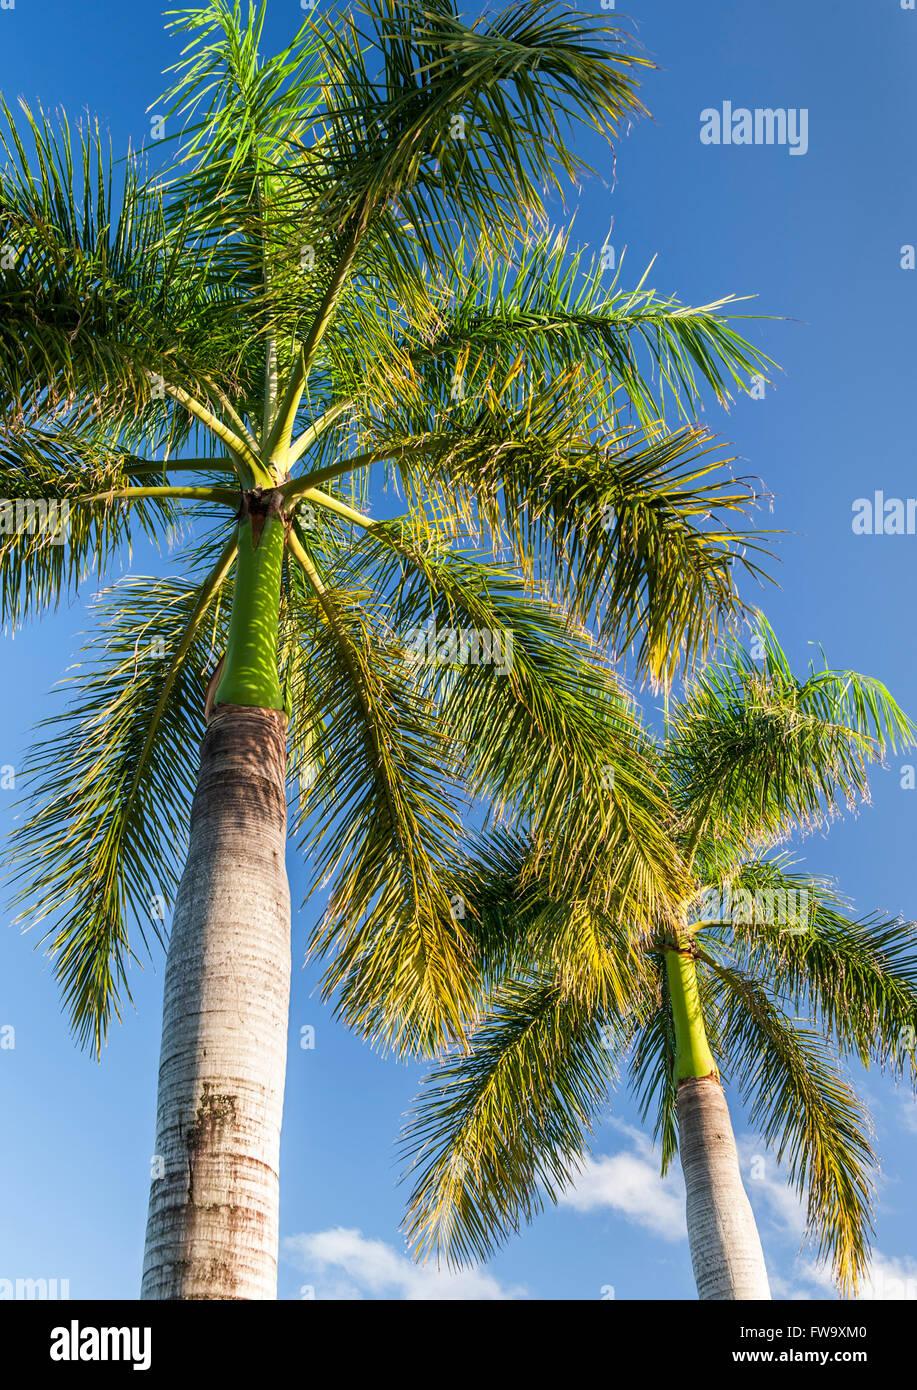 Palm tree in Mauritius. Immagini Stock